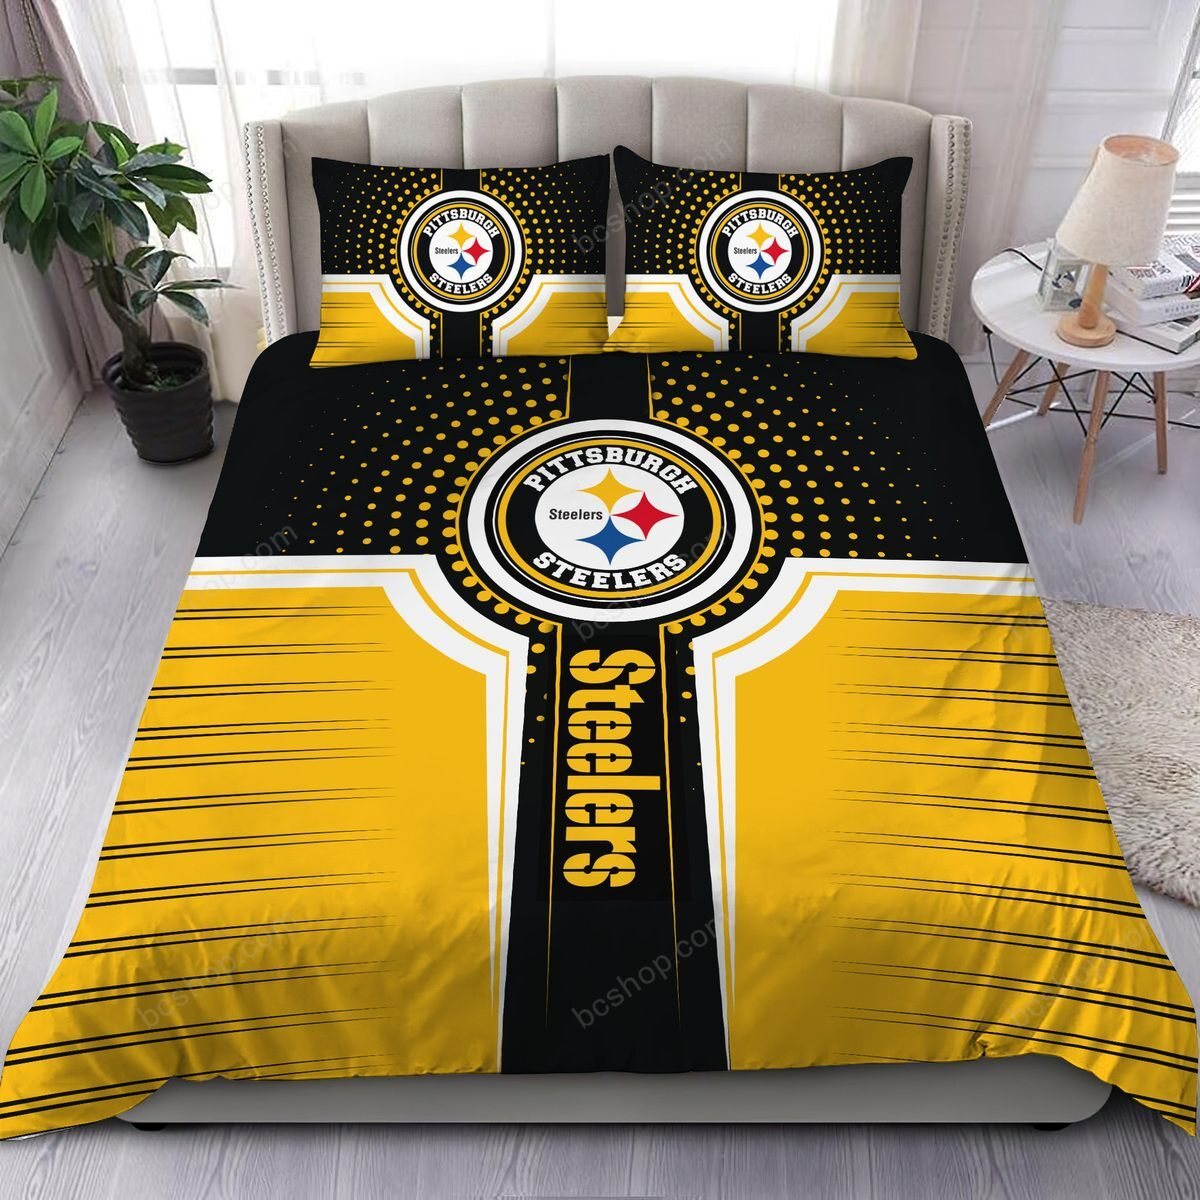 NFL Pittsburgh Steelers Bedding Set